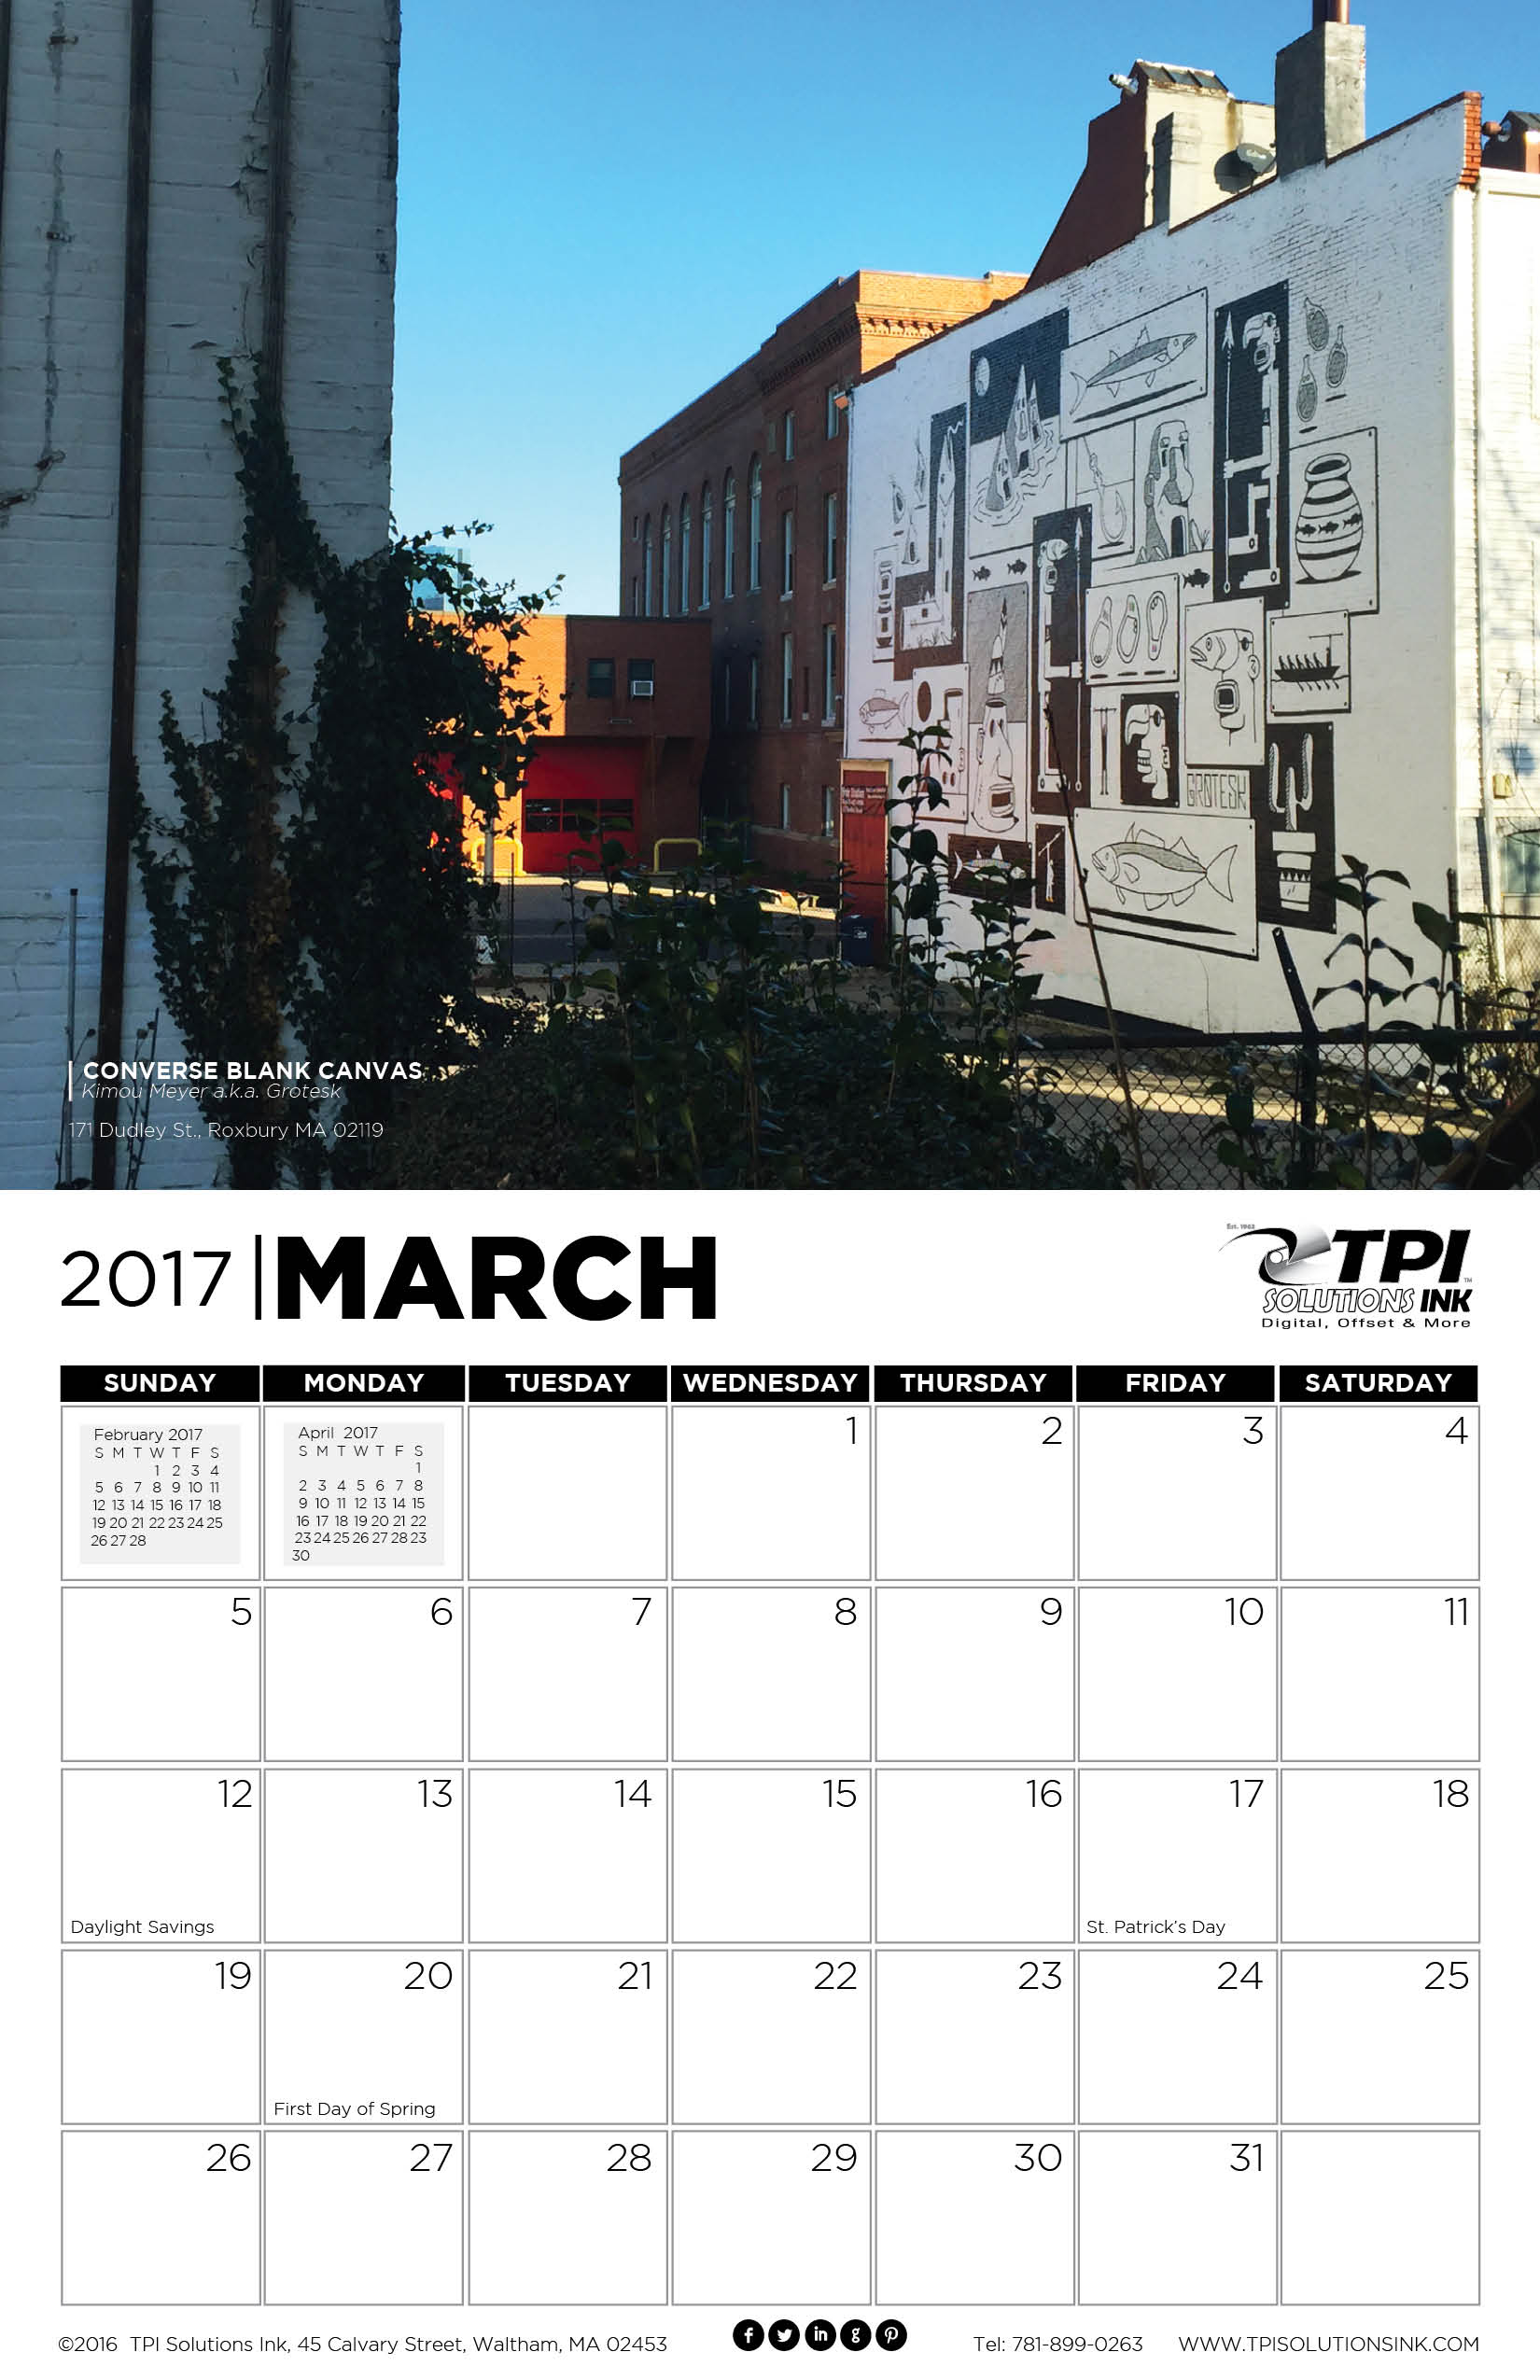 2017_MARCH.jpg